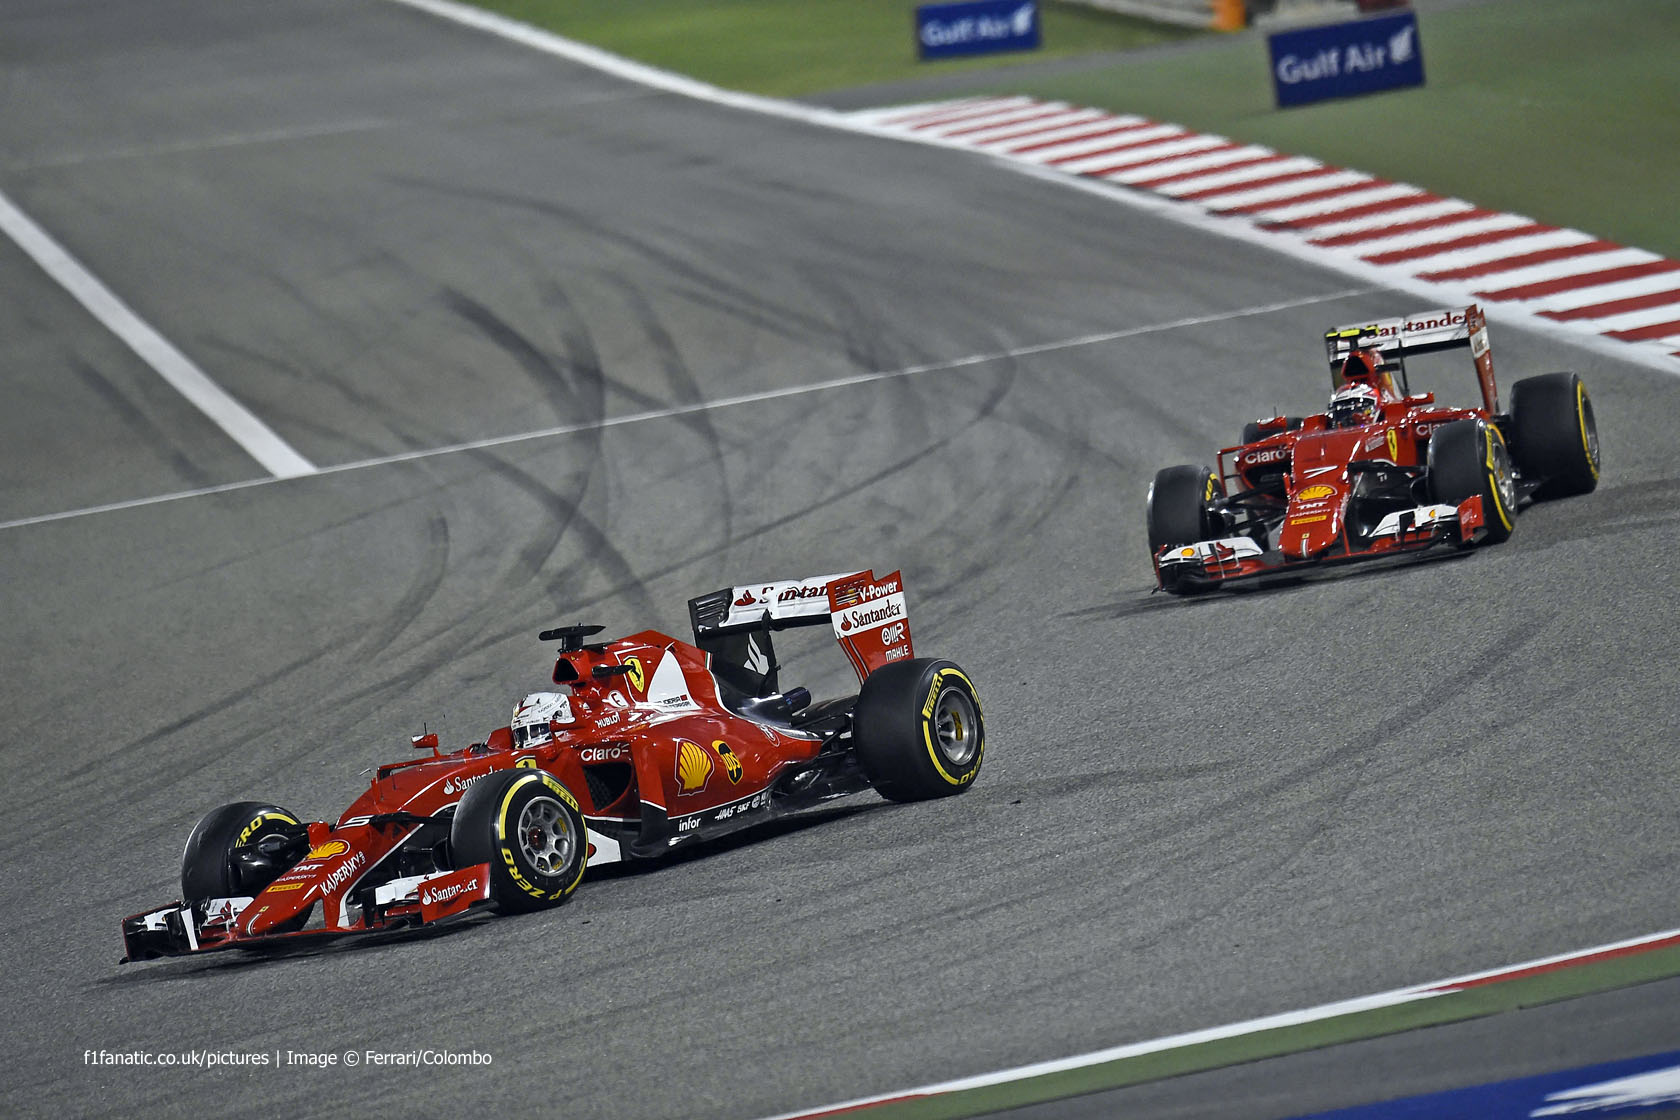 Sebastian Vettel, Ferrari, Bahrain International Circuit, 2015